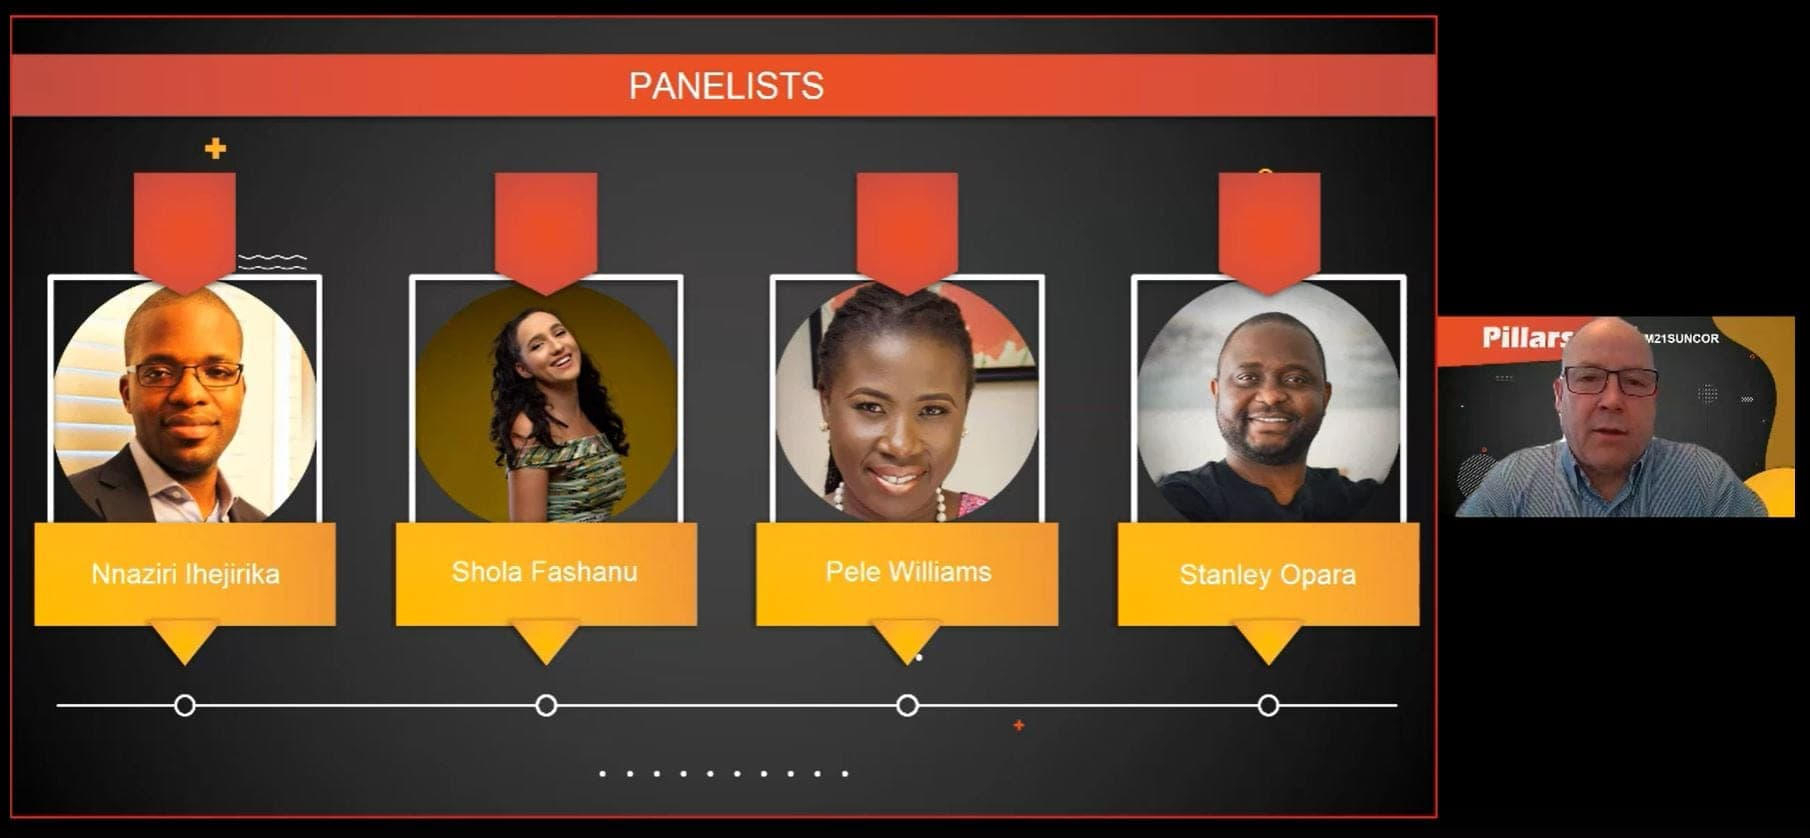 Suncor's Black History Month Panel Discussion